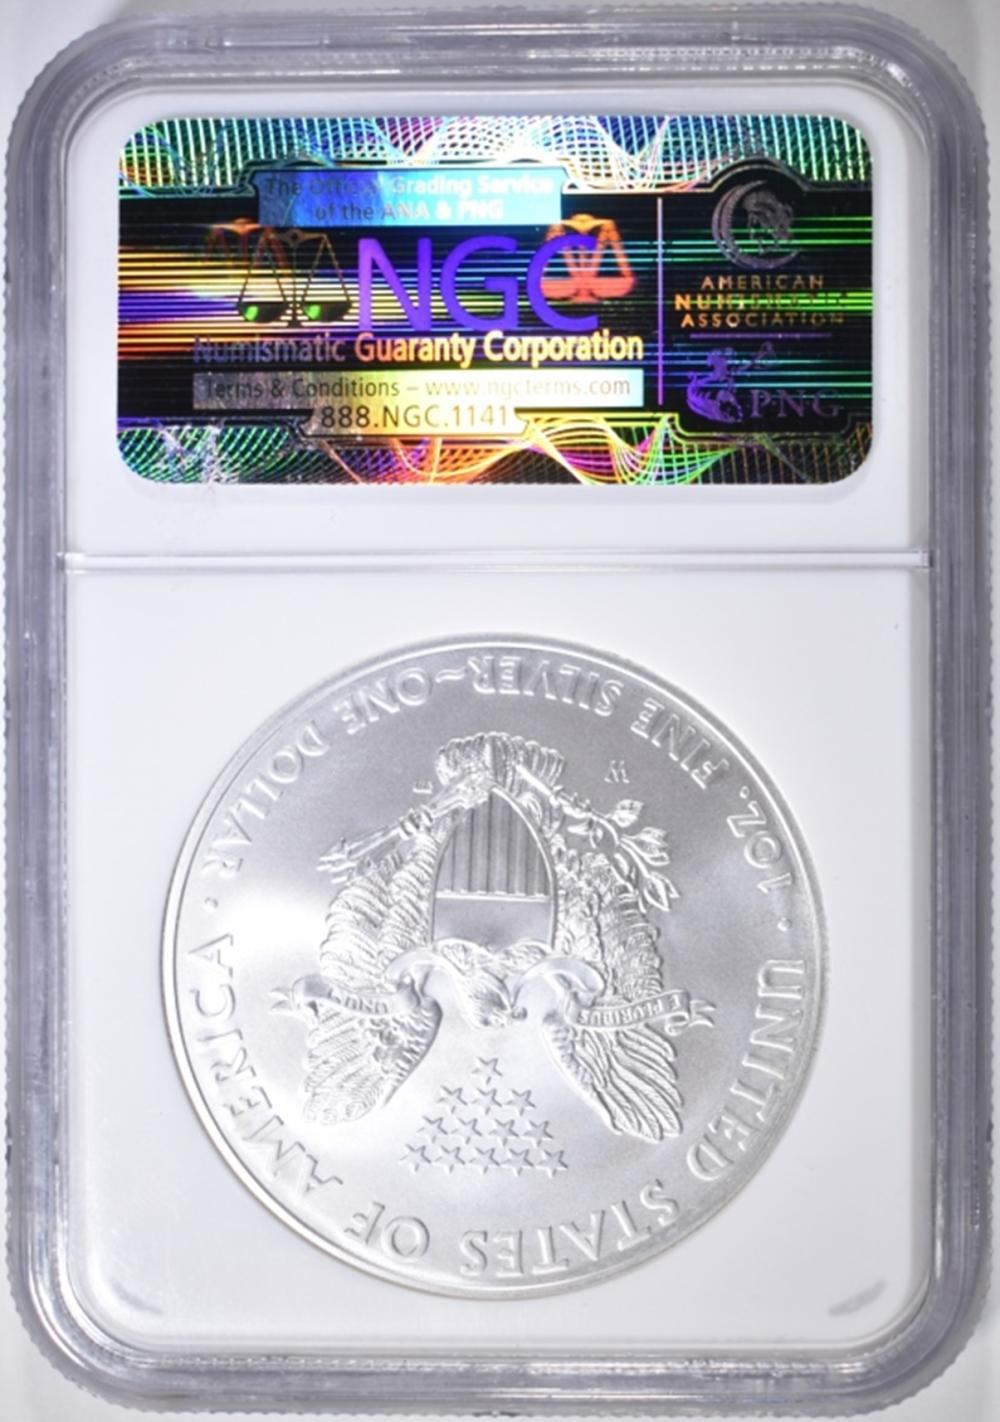 Lot 65: 2008-W ASE NGC MS-70